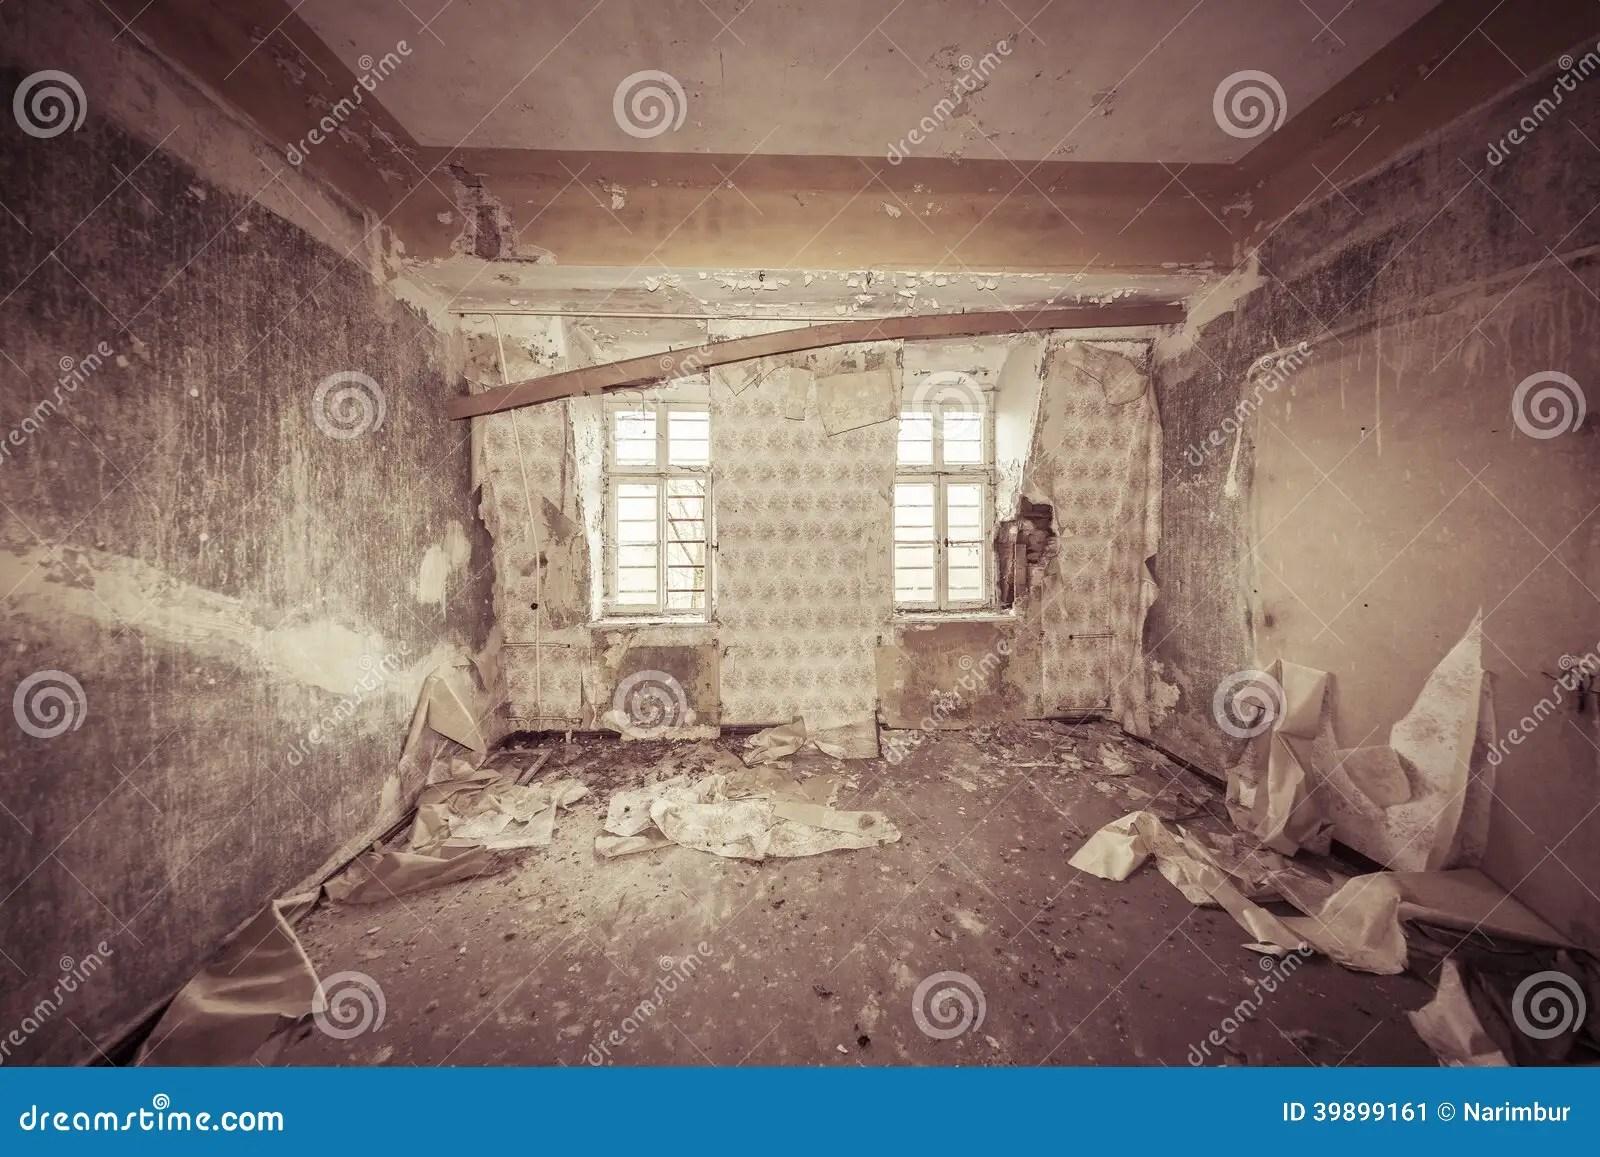 Interior Decoration Wallpaper